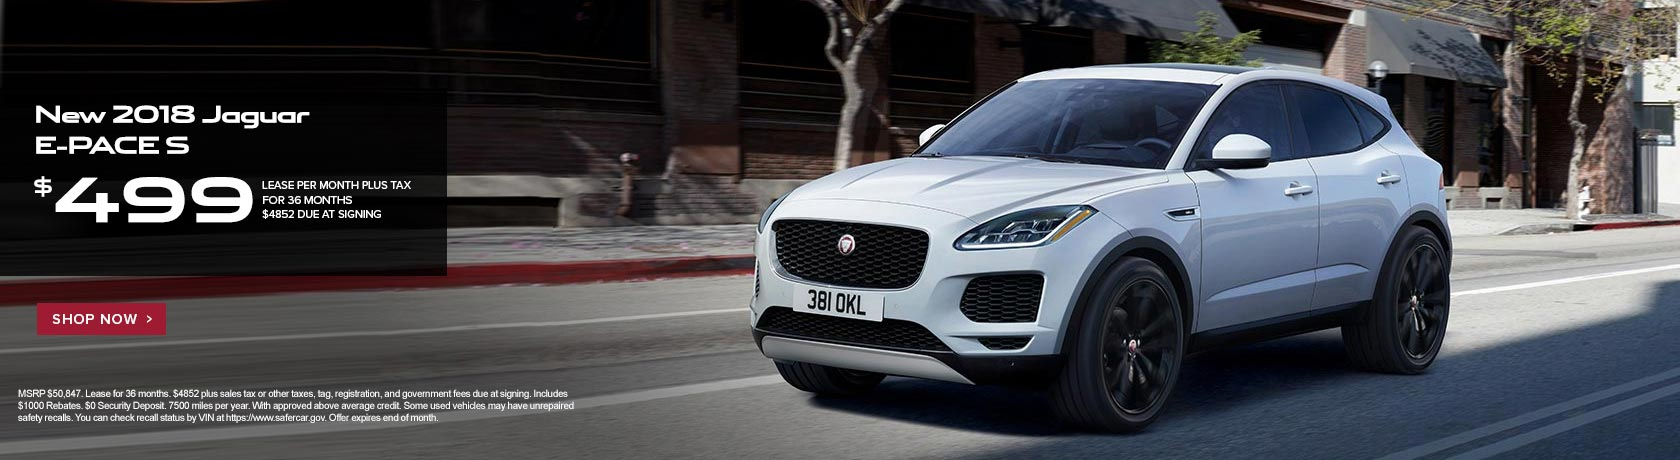 cpo nearest jaguar dealership certified driving park owned dealer pre place